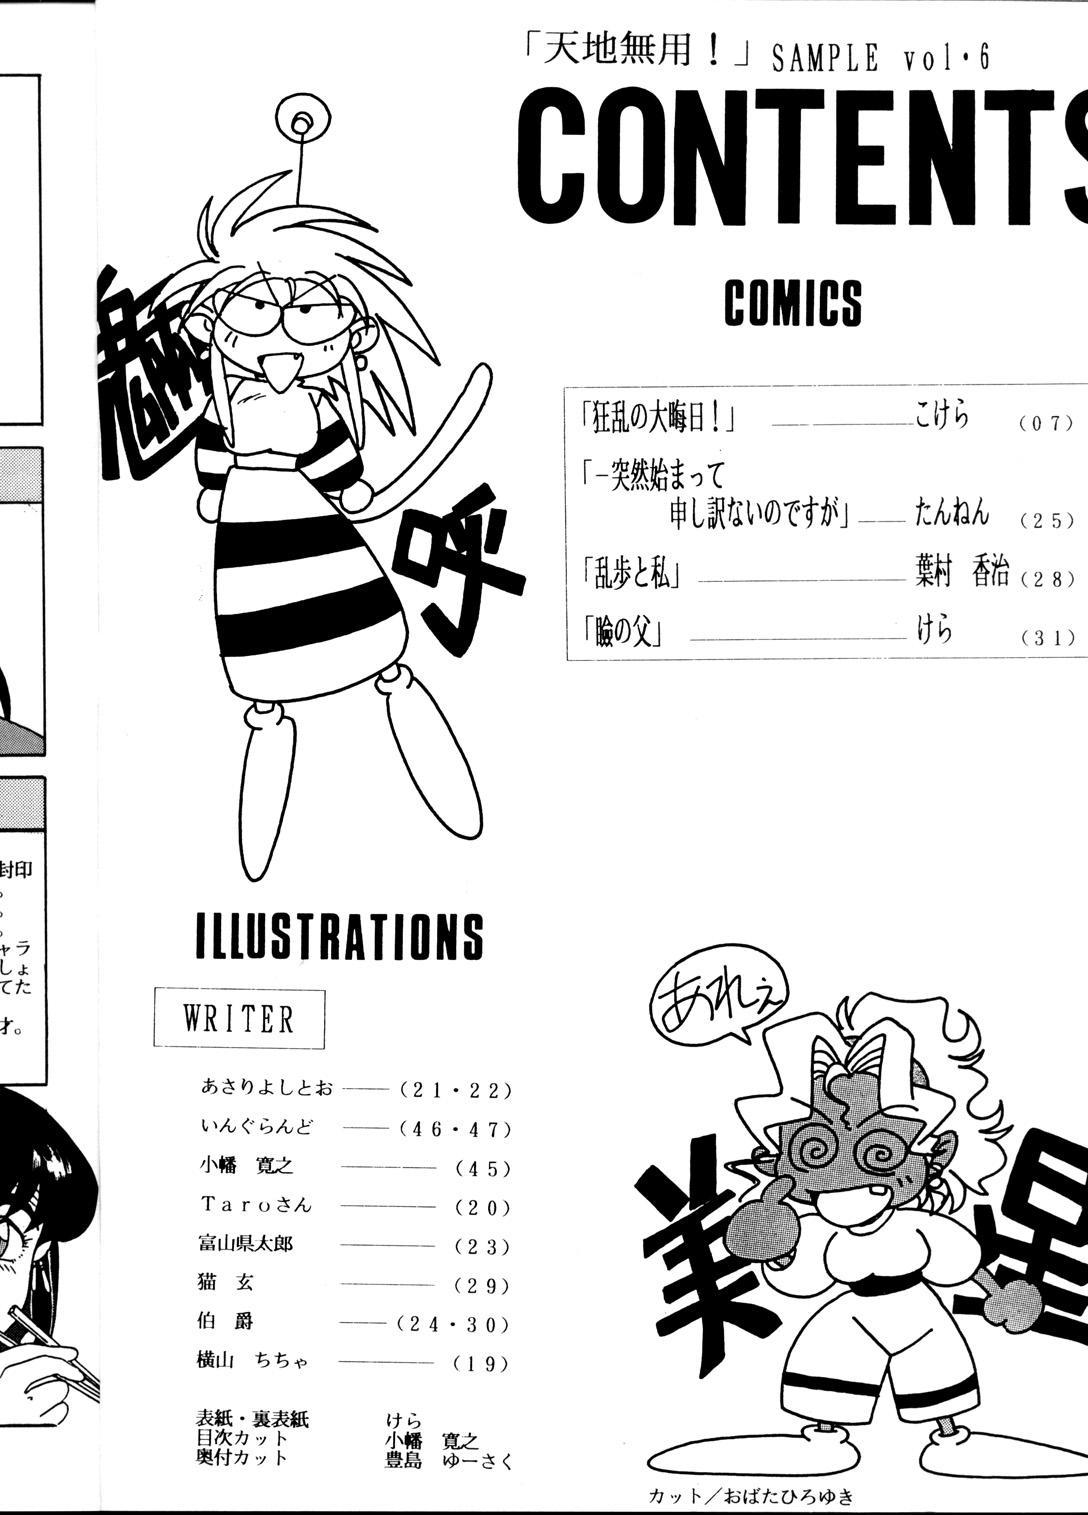 Tenchi Muyou! Sample Vol 6 2